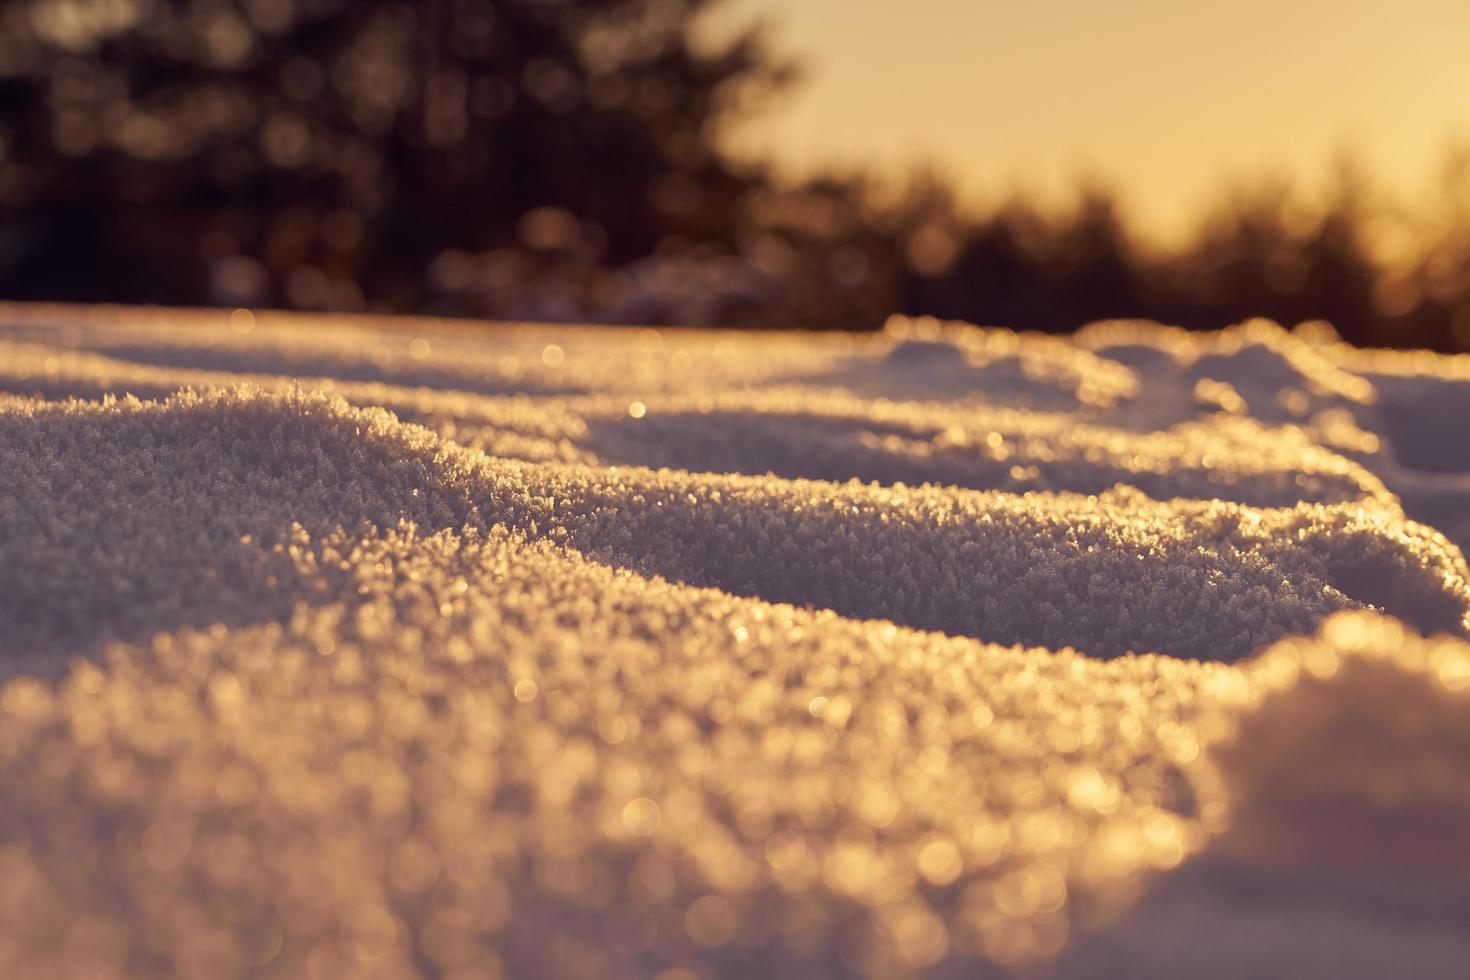 Snow in sunlight photo